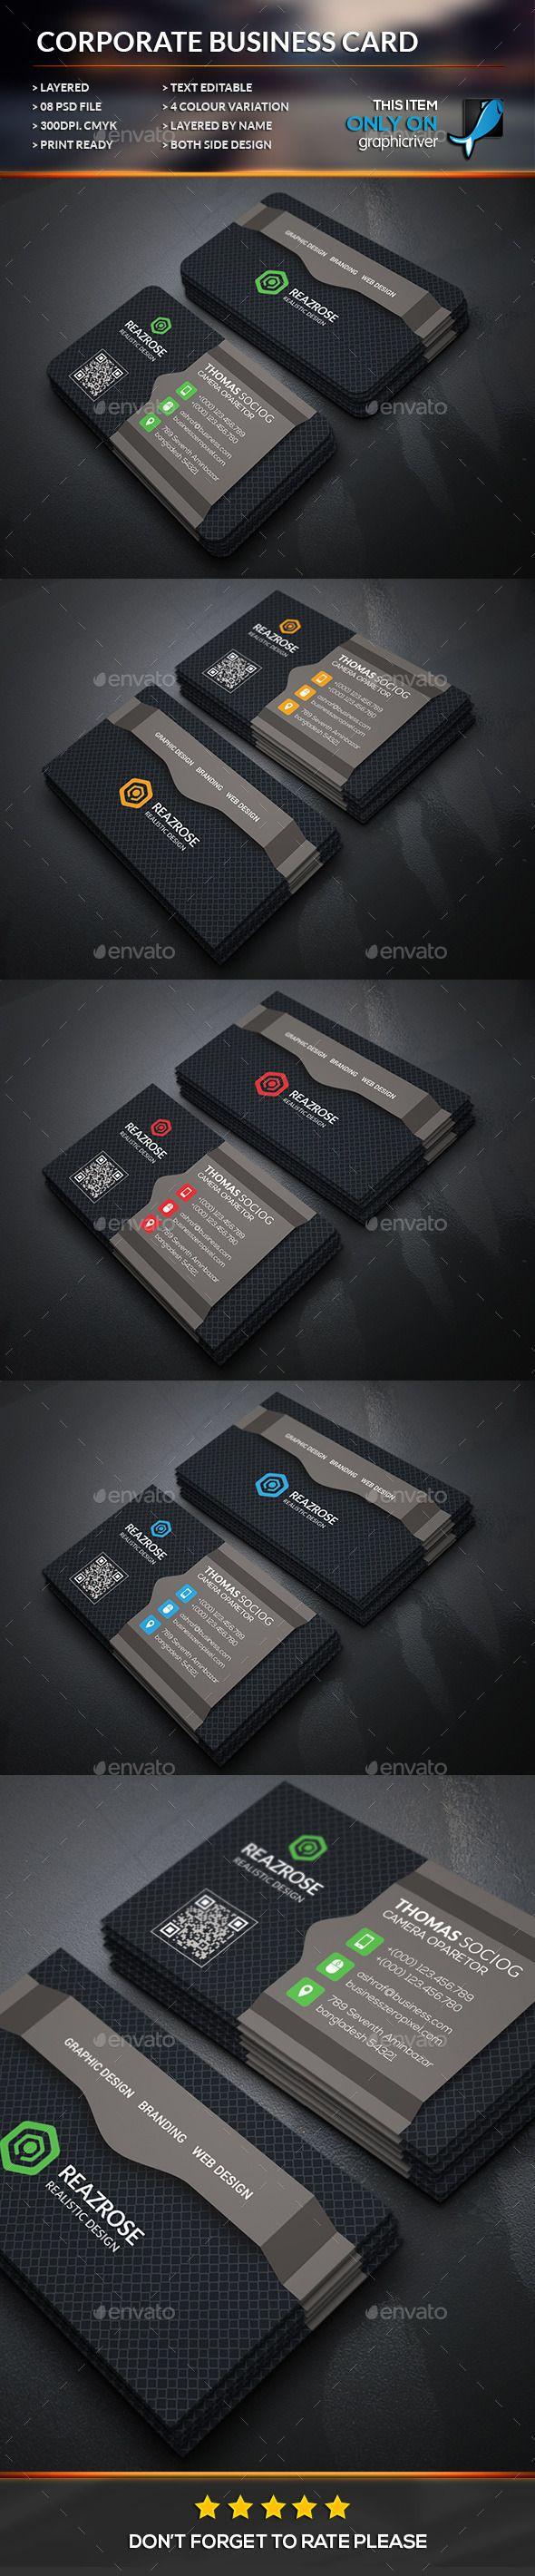 Creative Corporate Business Card Template #design Download: http://graphicriver.net/item/creative-corporate-business-card/12611120?ref=ksioks